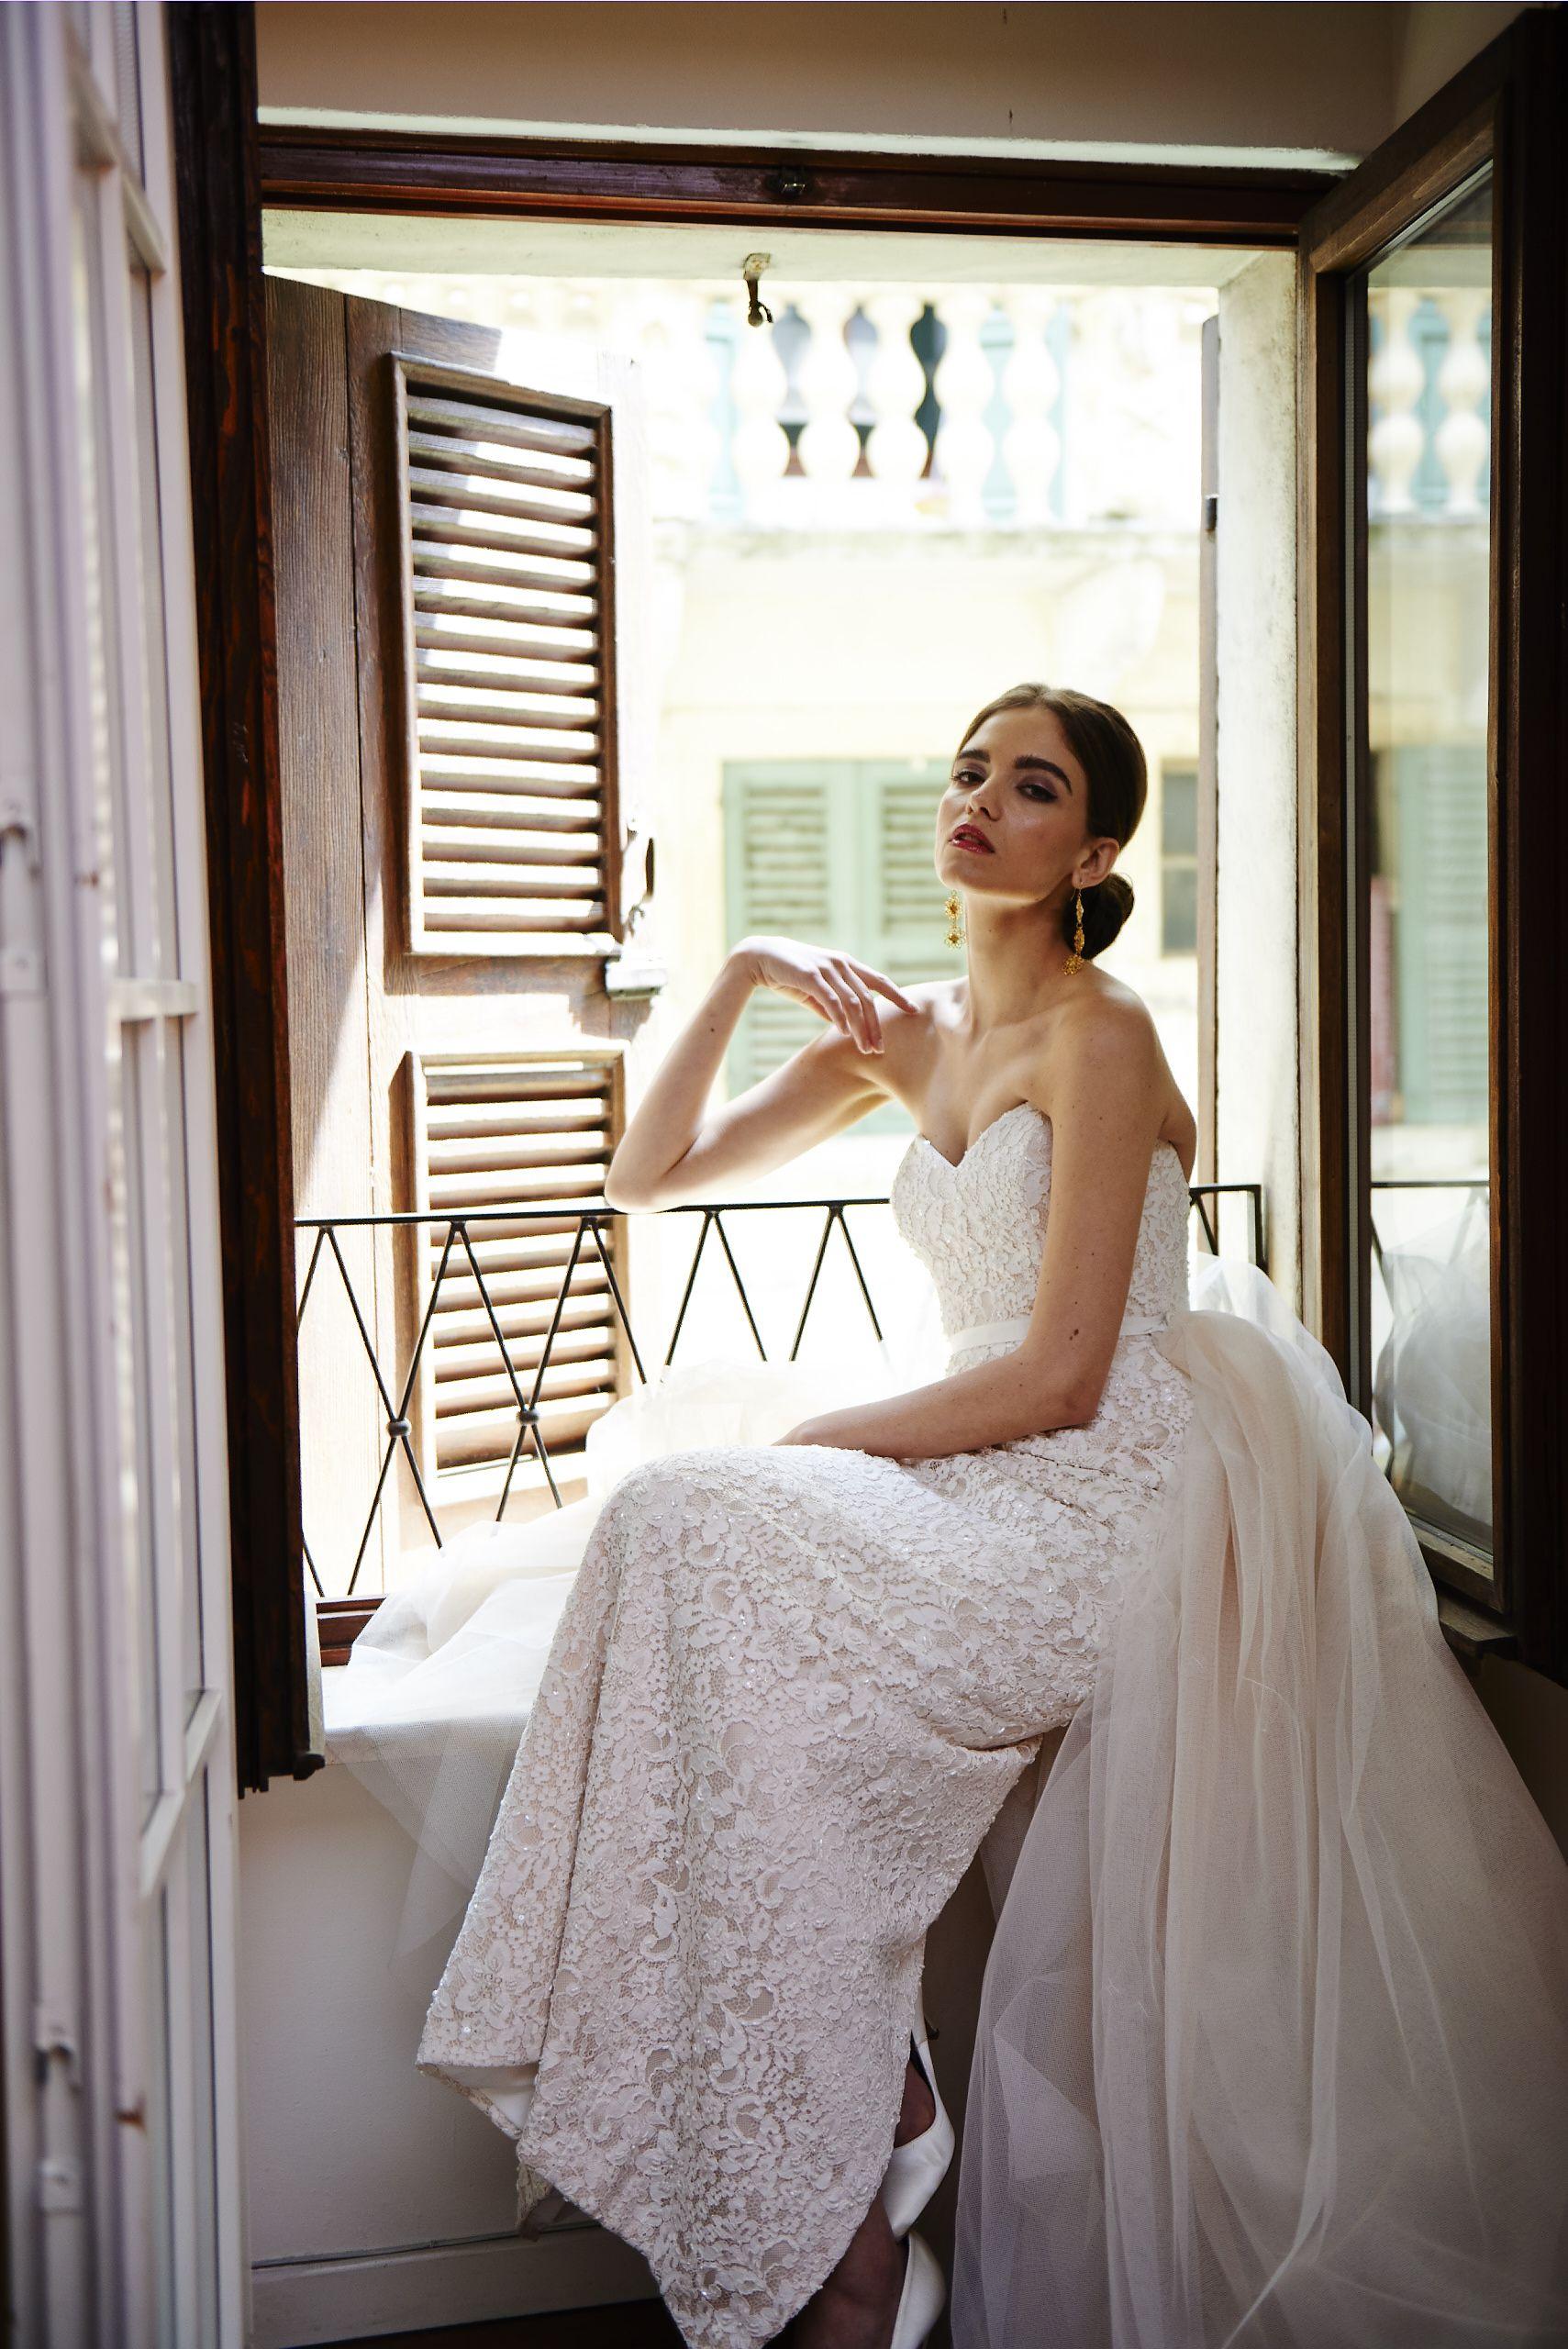 Annabel dress  Corte realdi Verona Italy. #weddingdress #stephanieallin #lverona #bridaldesign #italianwedding …